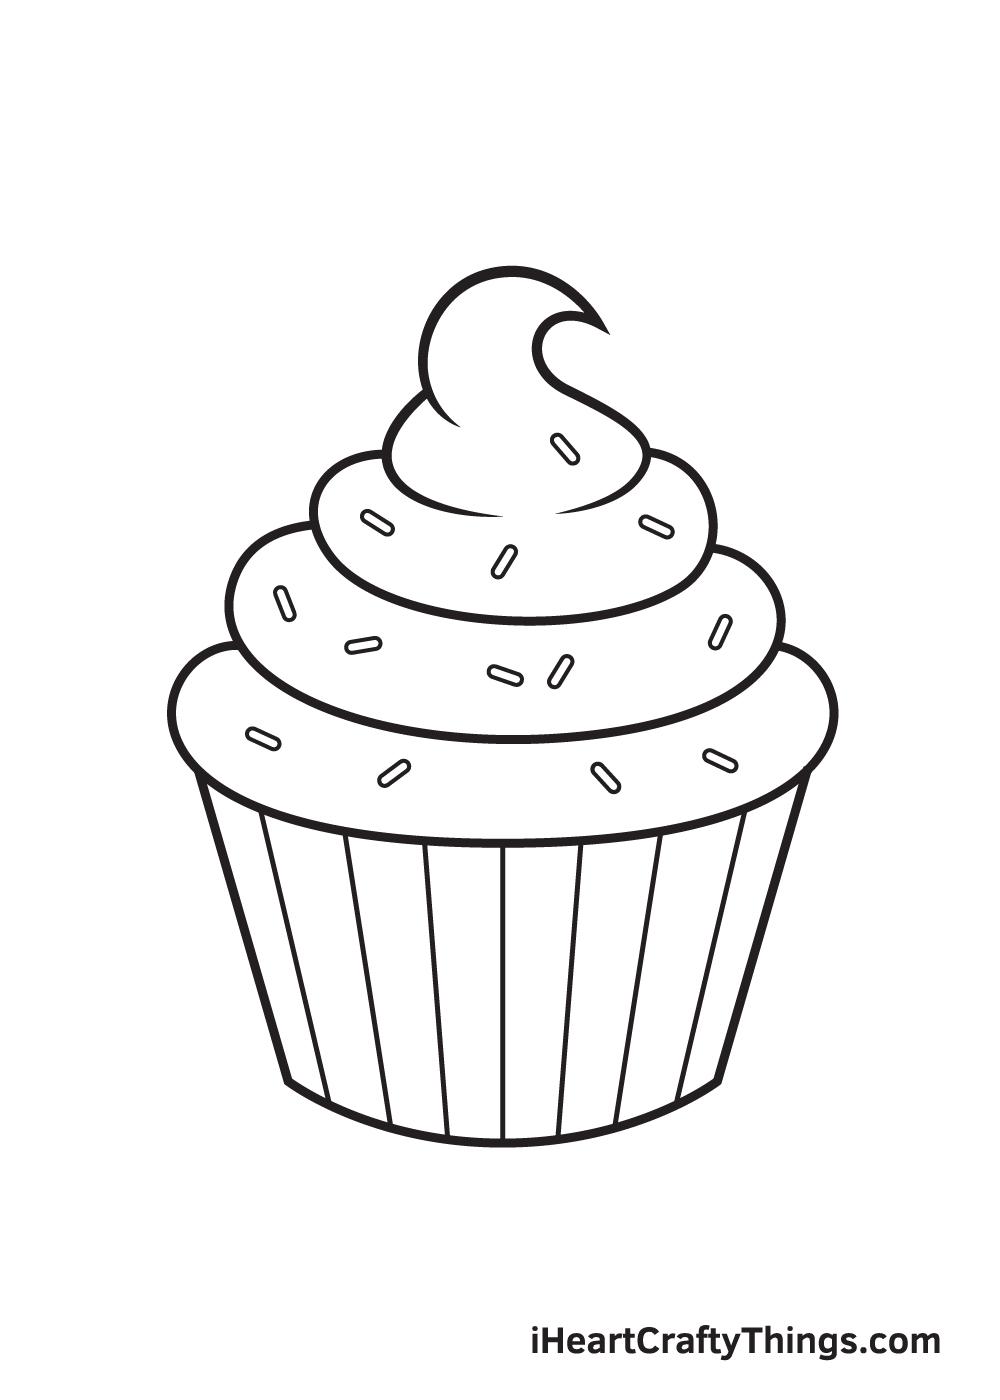 Cupcake Drawing – Step 8